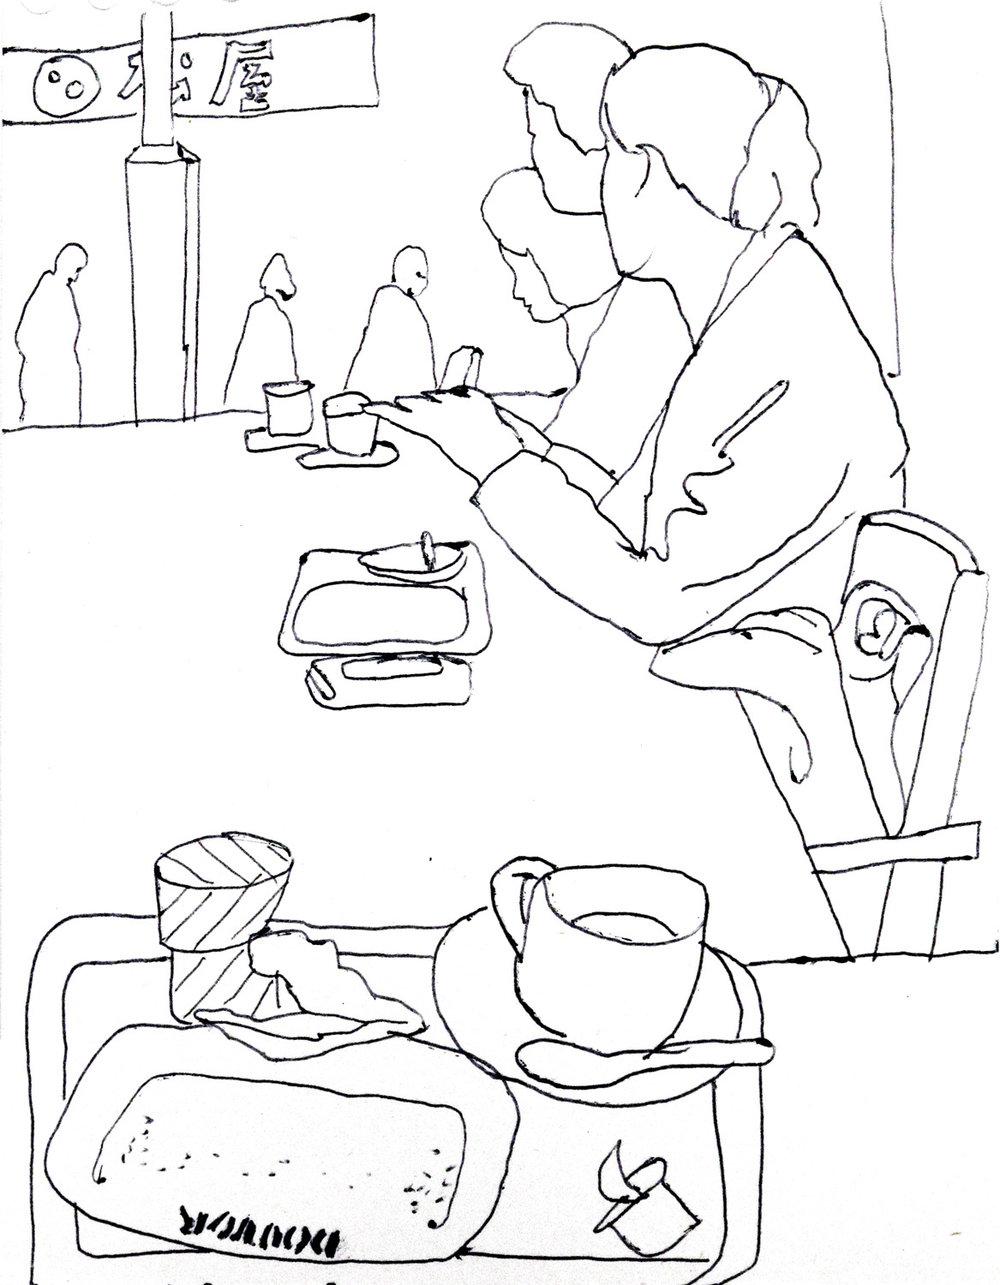 Sketch in a Doutor coffee shop, Tokyo